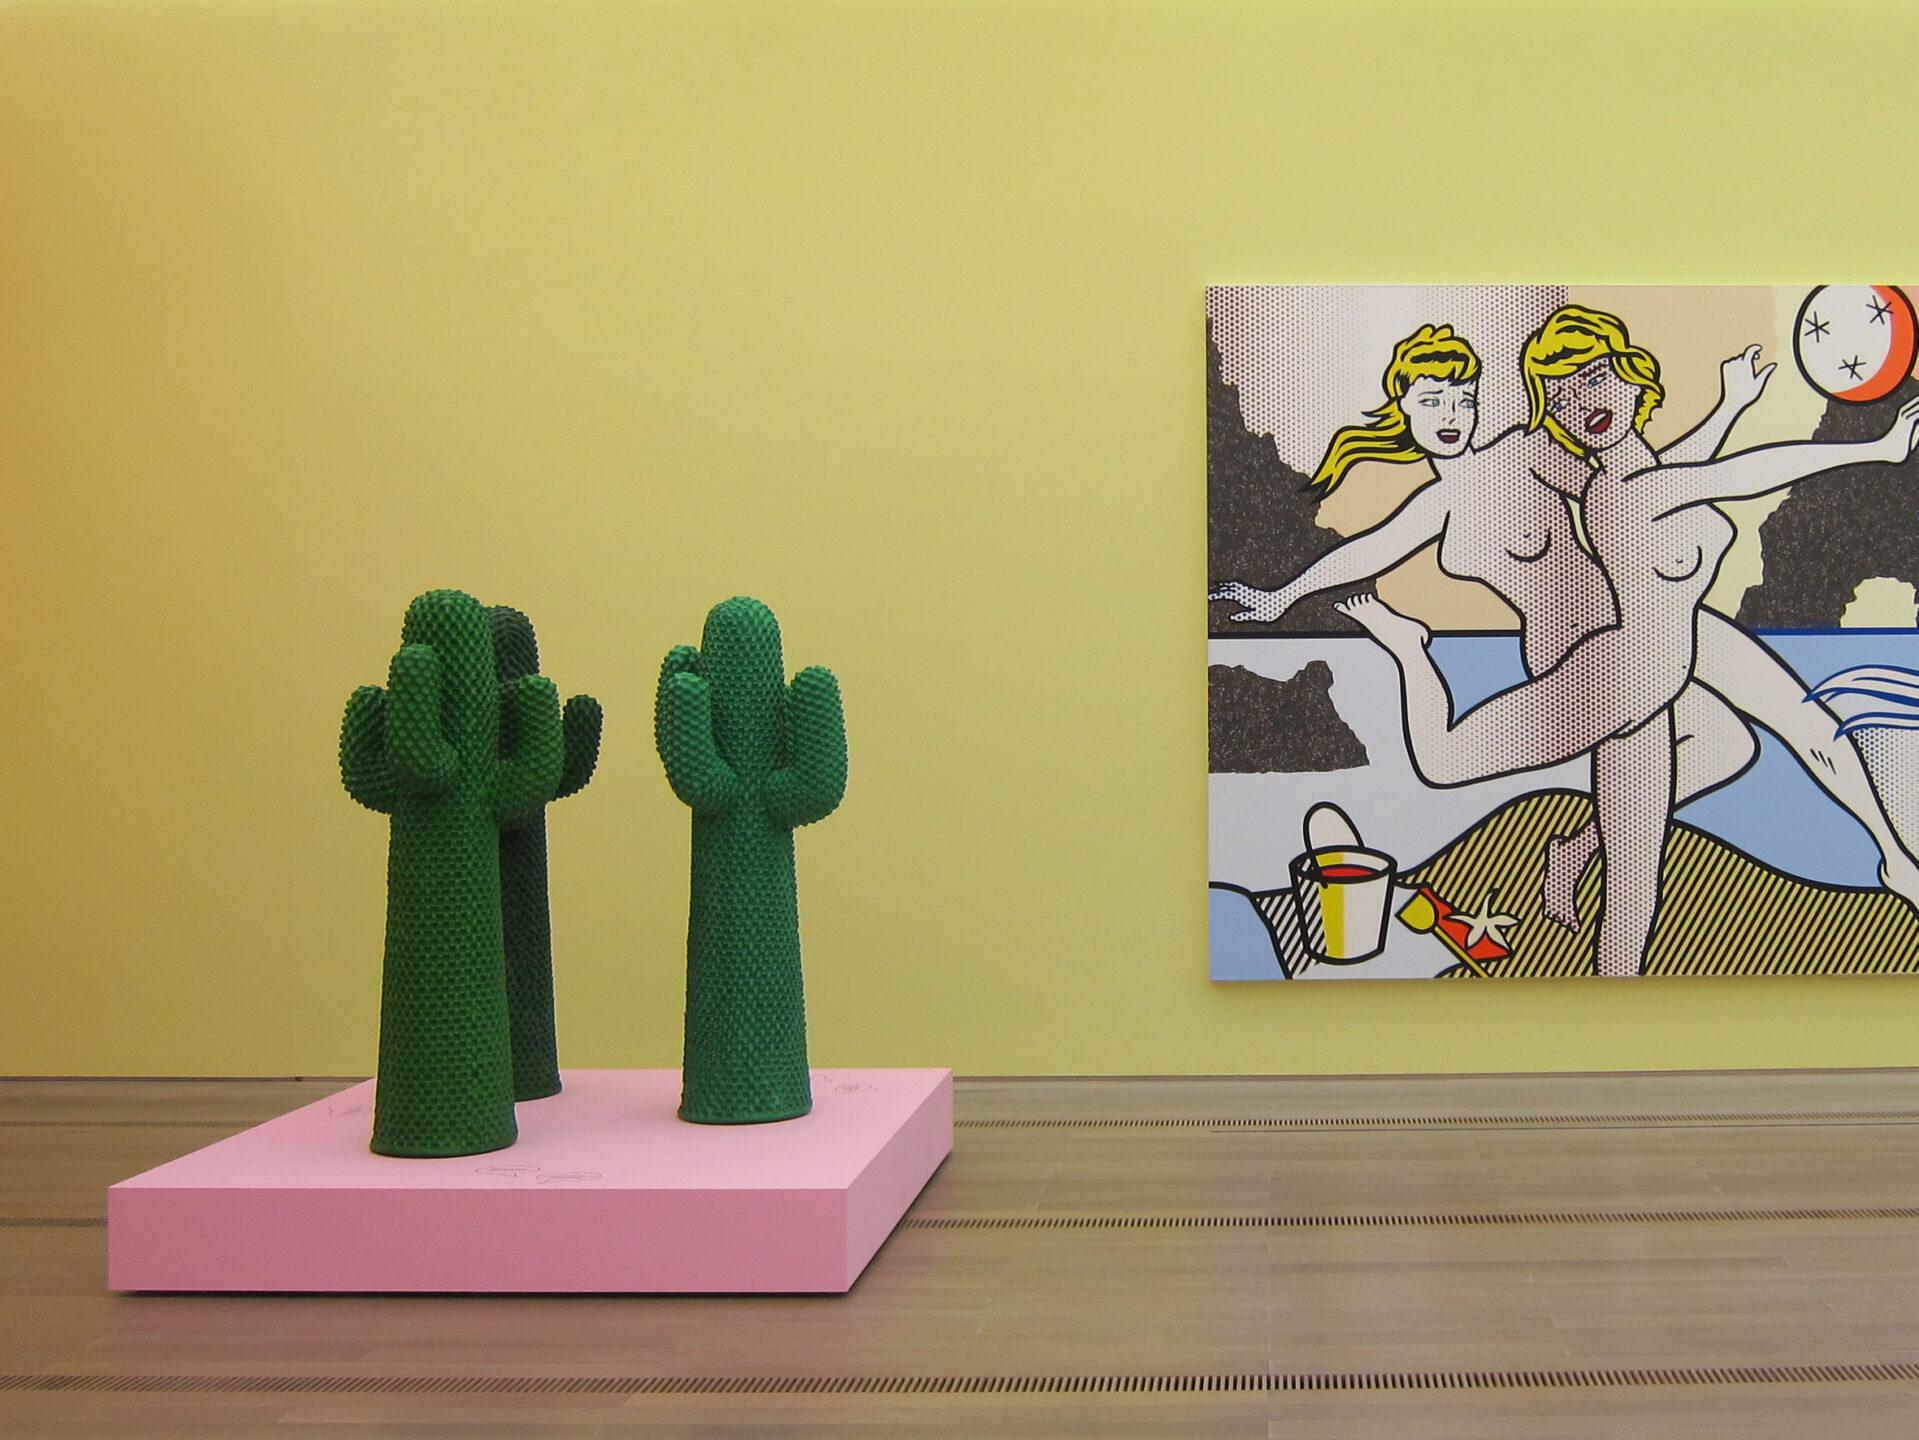 Cactus Gufram, arredamento di design italiano